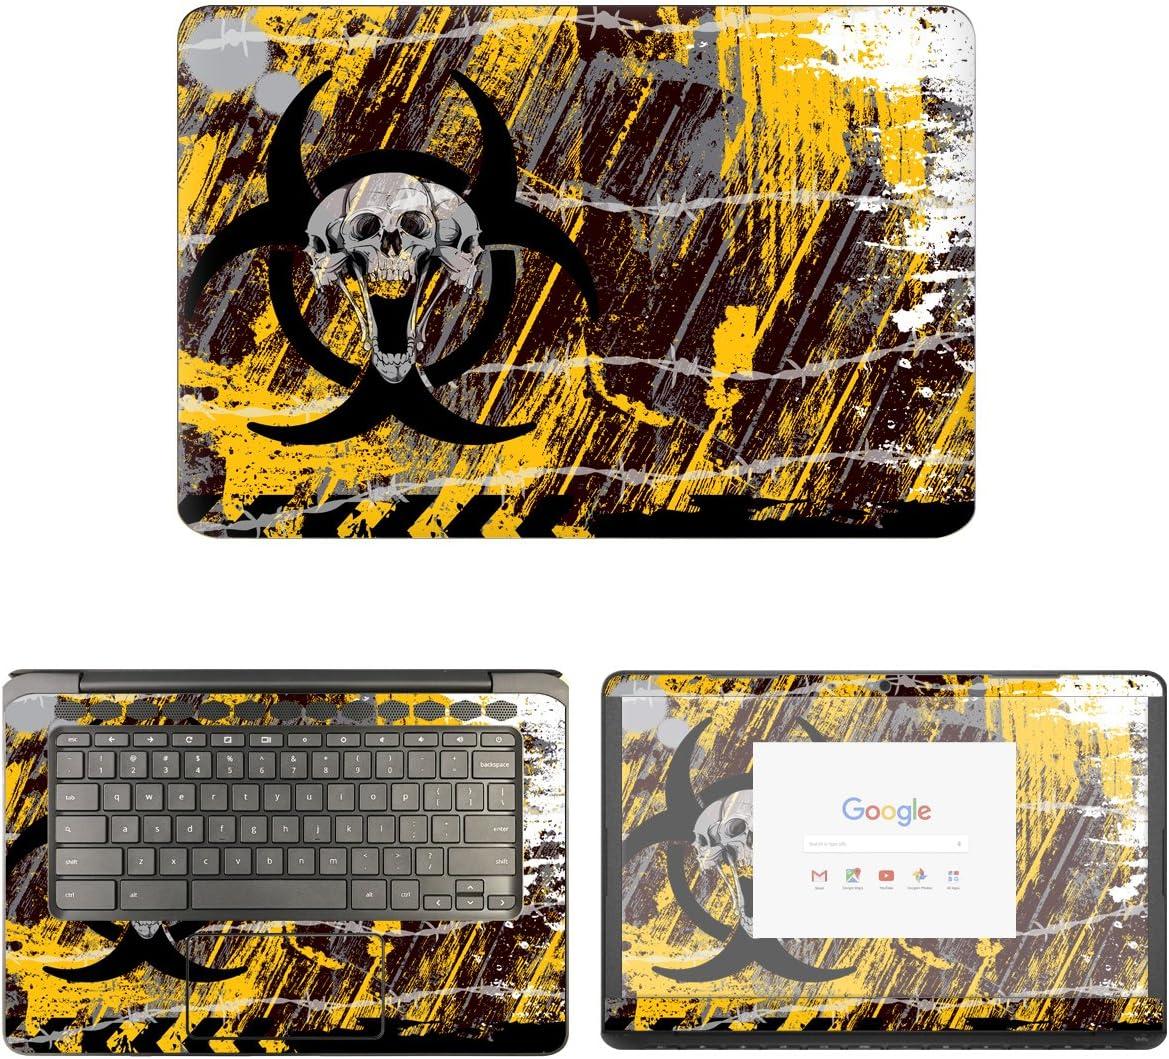 decalrus - Protective Decal Hazard Skin Sticker for HP ChromeBook 14-CA061DX (14